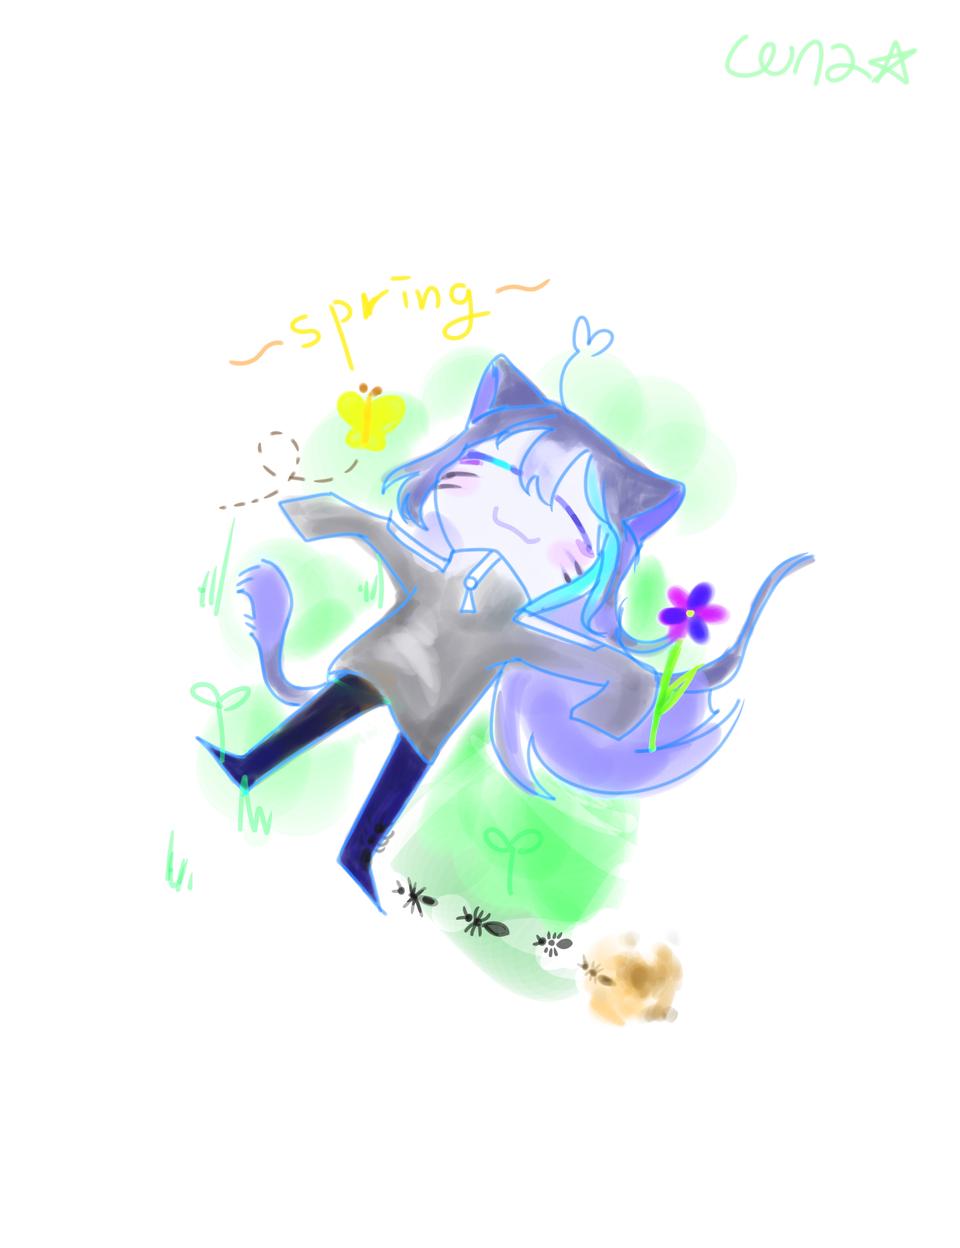 Spring come🌱🌼💐💮 Illust of LUNA☆_루나 medibangpaint oc original 귀여운캐릭터 self-portrait kawai 예쁜캐릭터 봄 spring